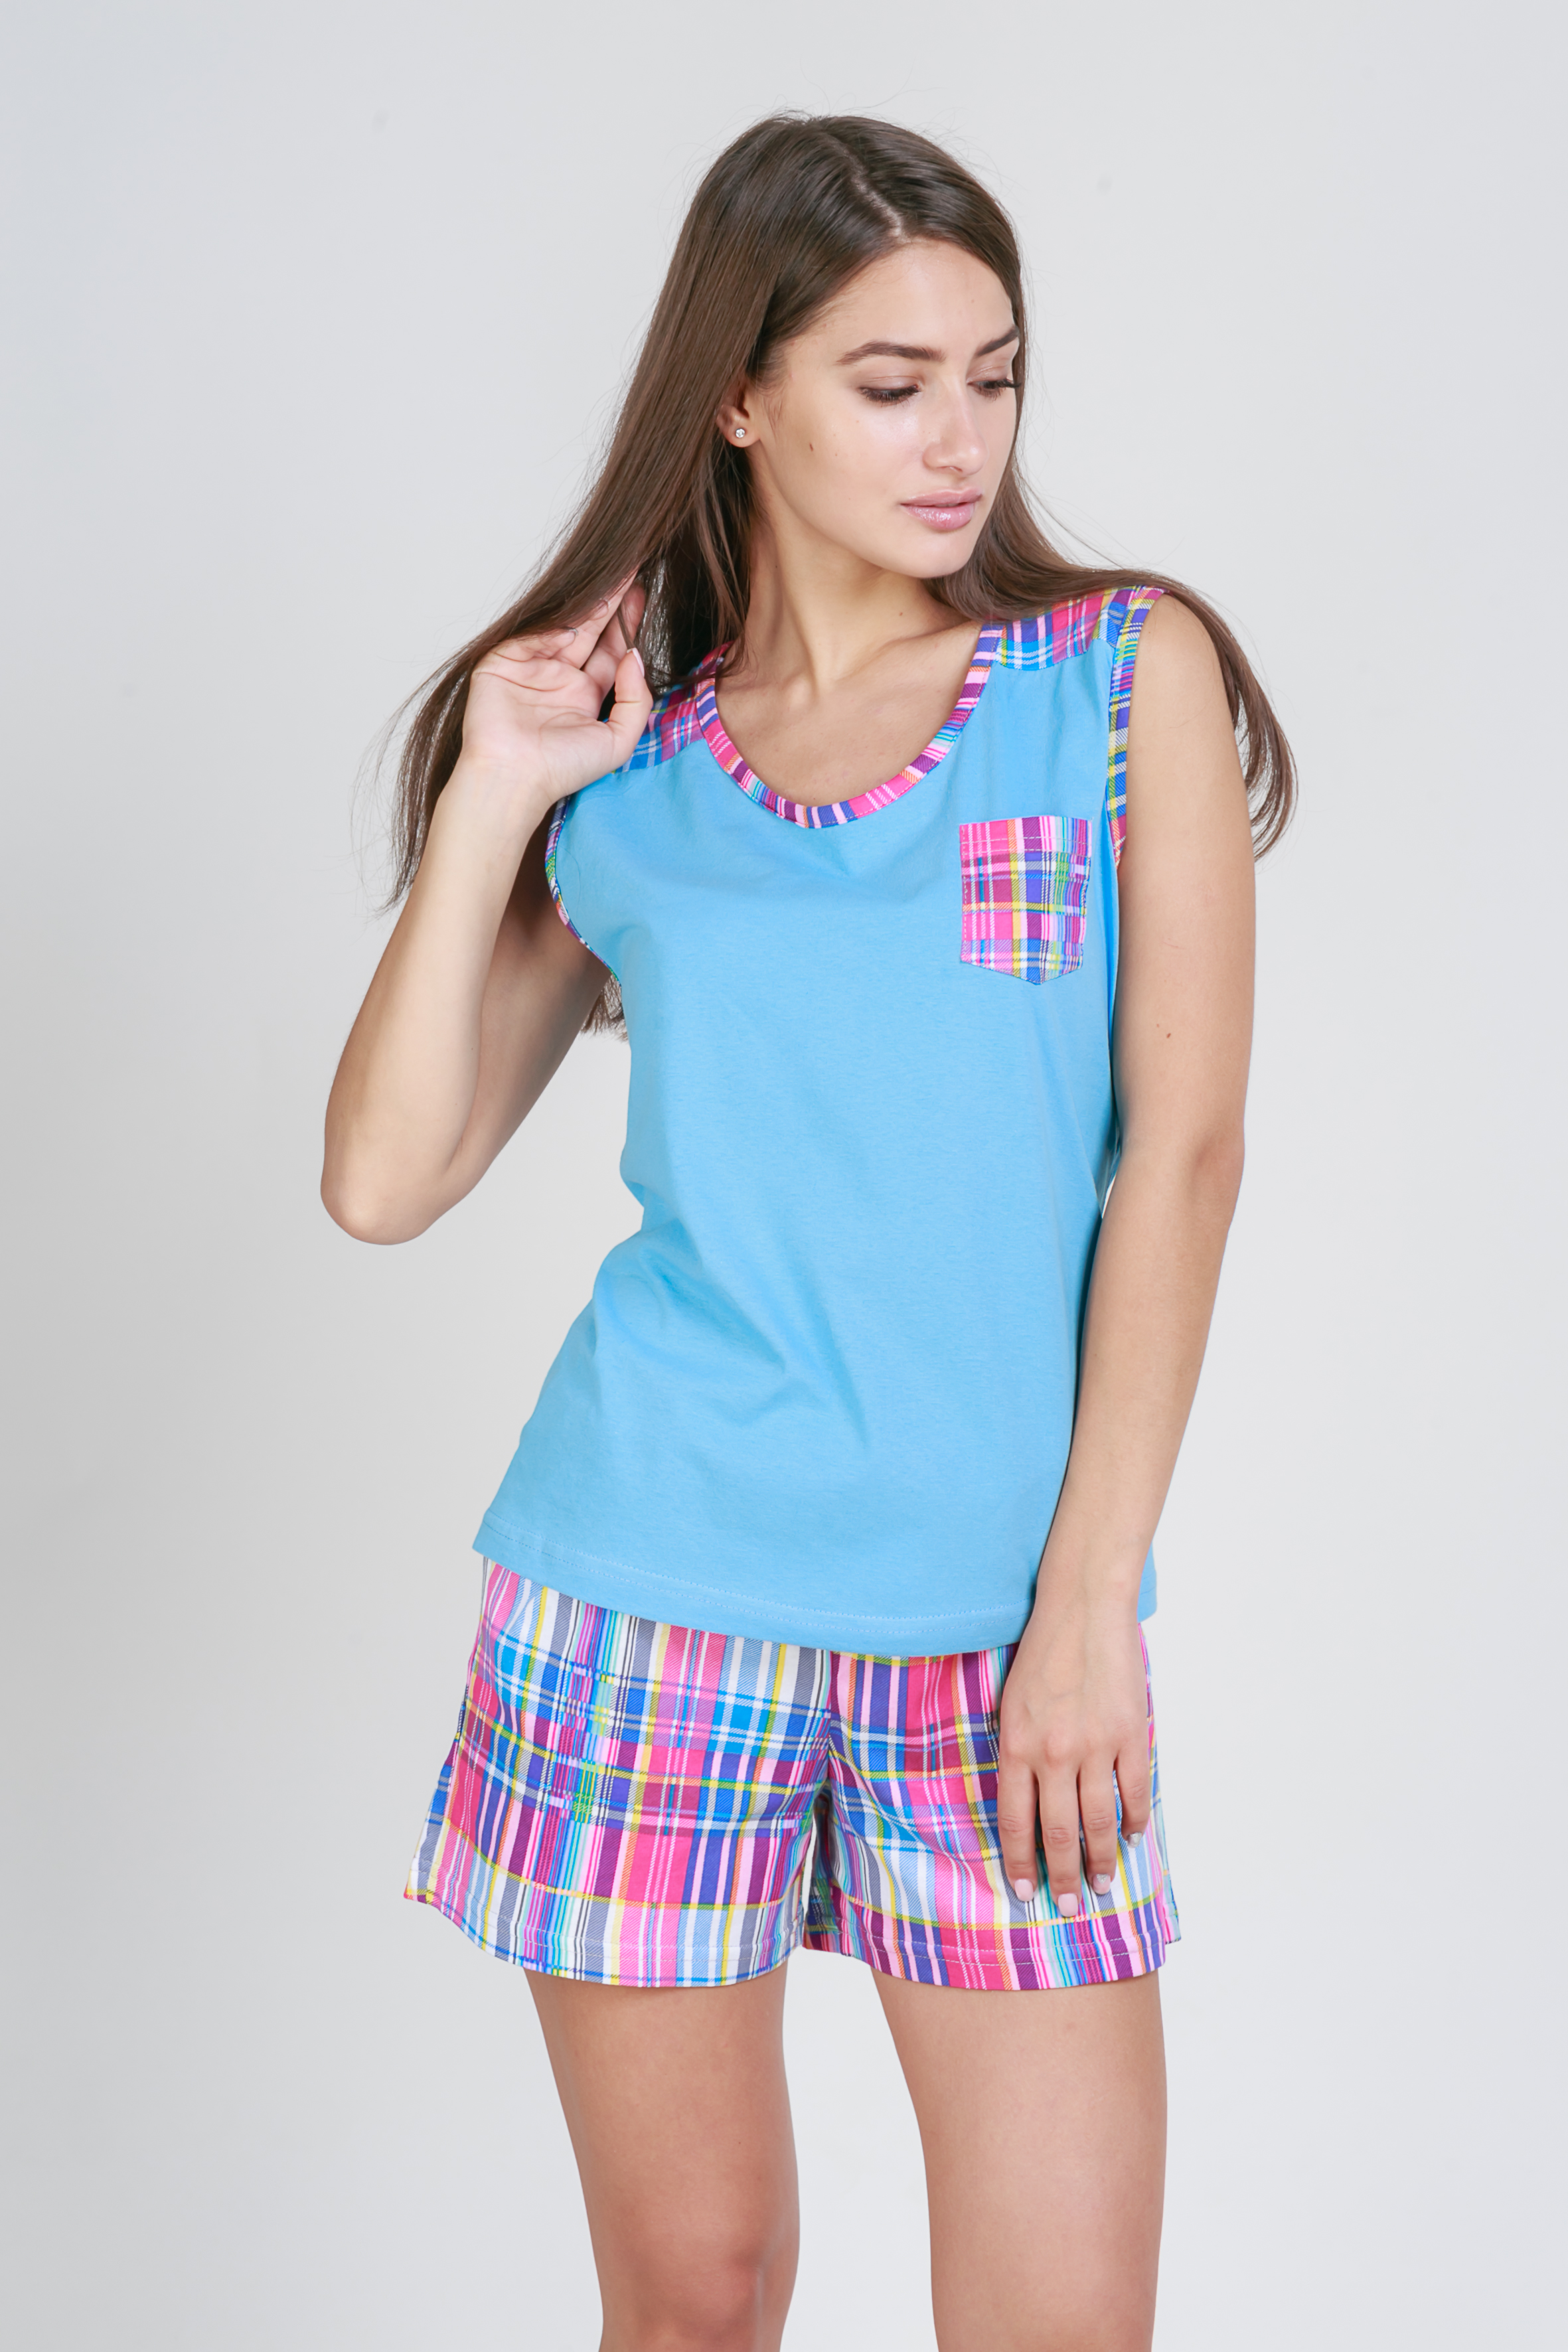 Пижамы Pastilla Пижама Сорренто (L-xL) пижама жен mia cara майка шорты botanical aw15 ubl lst 264 р 42 44 1119503